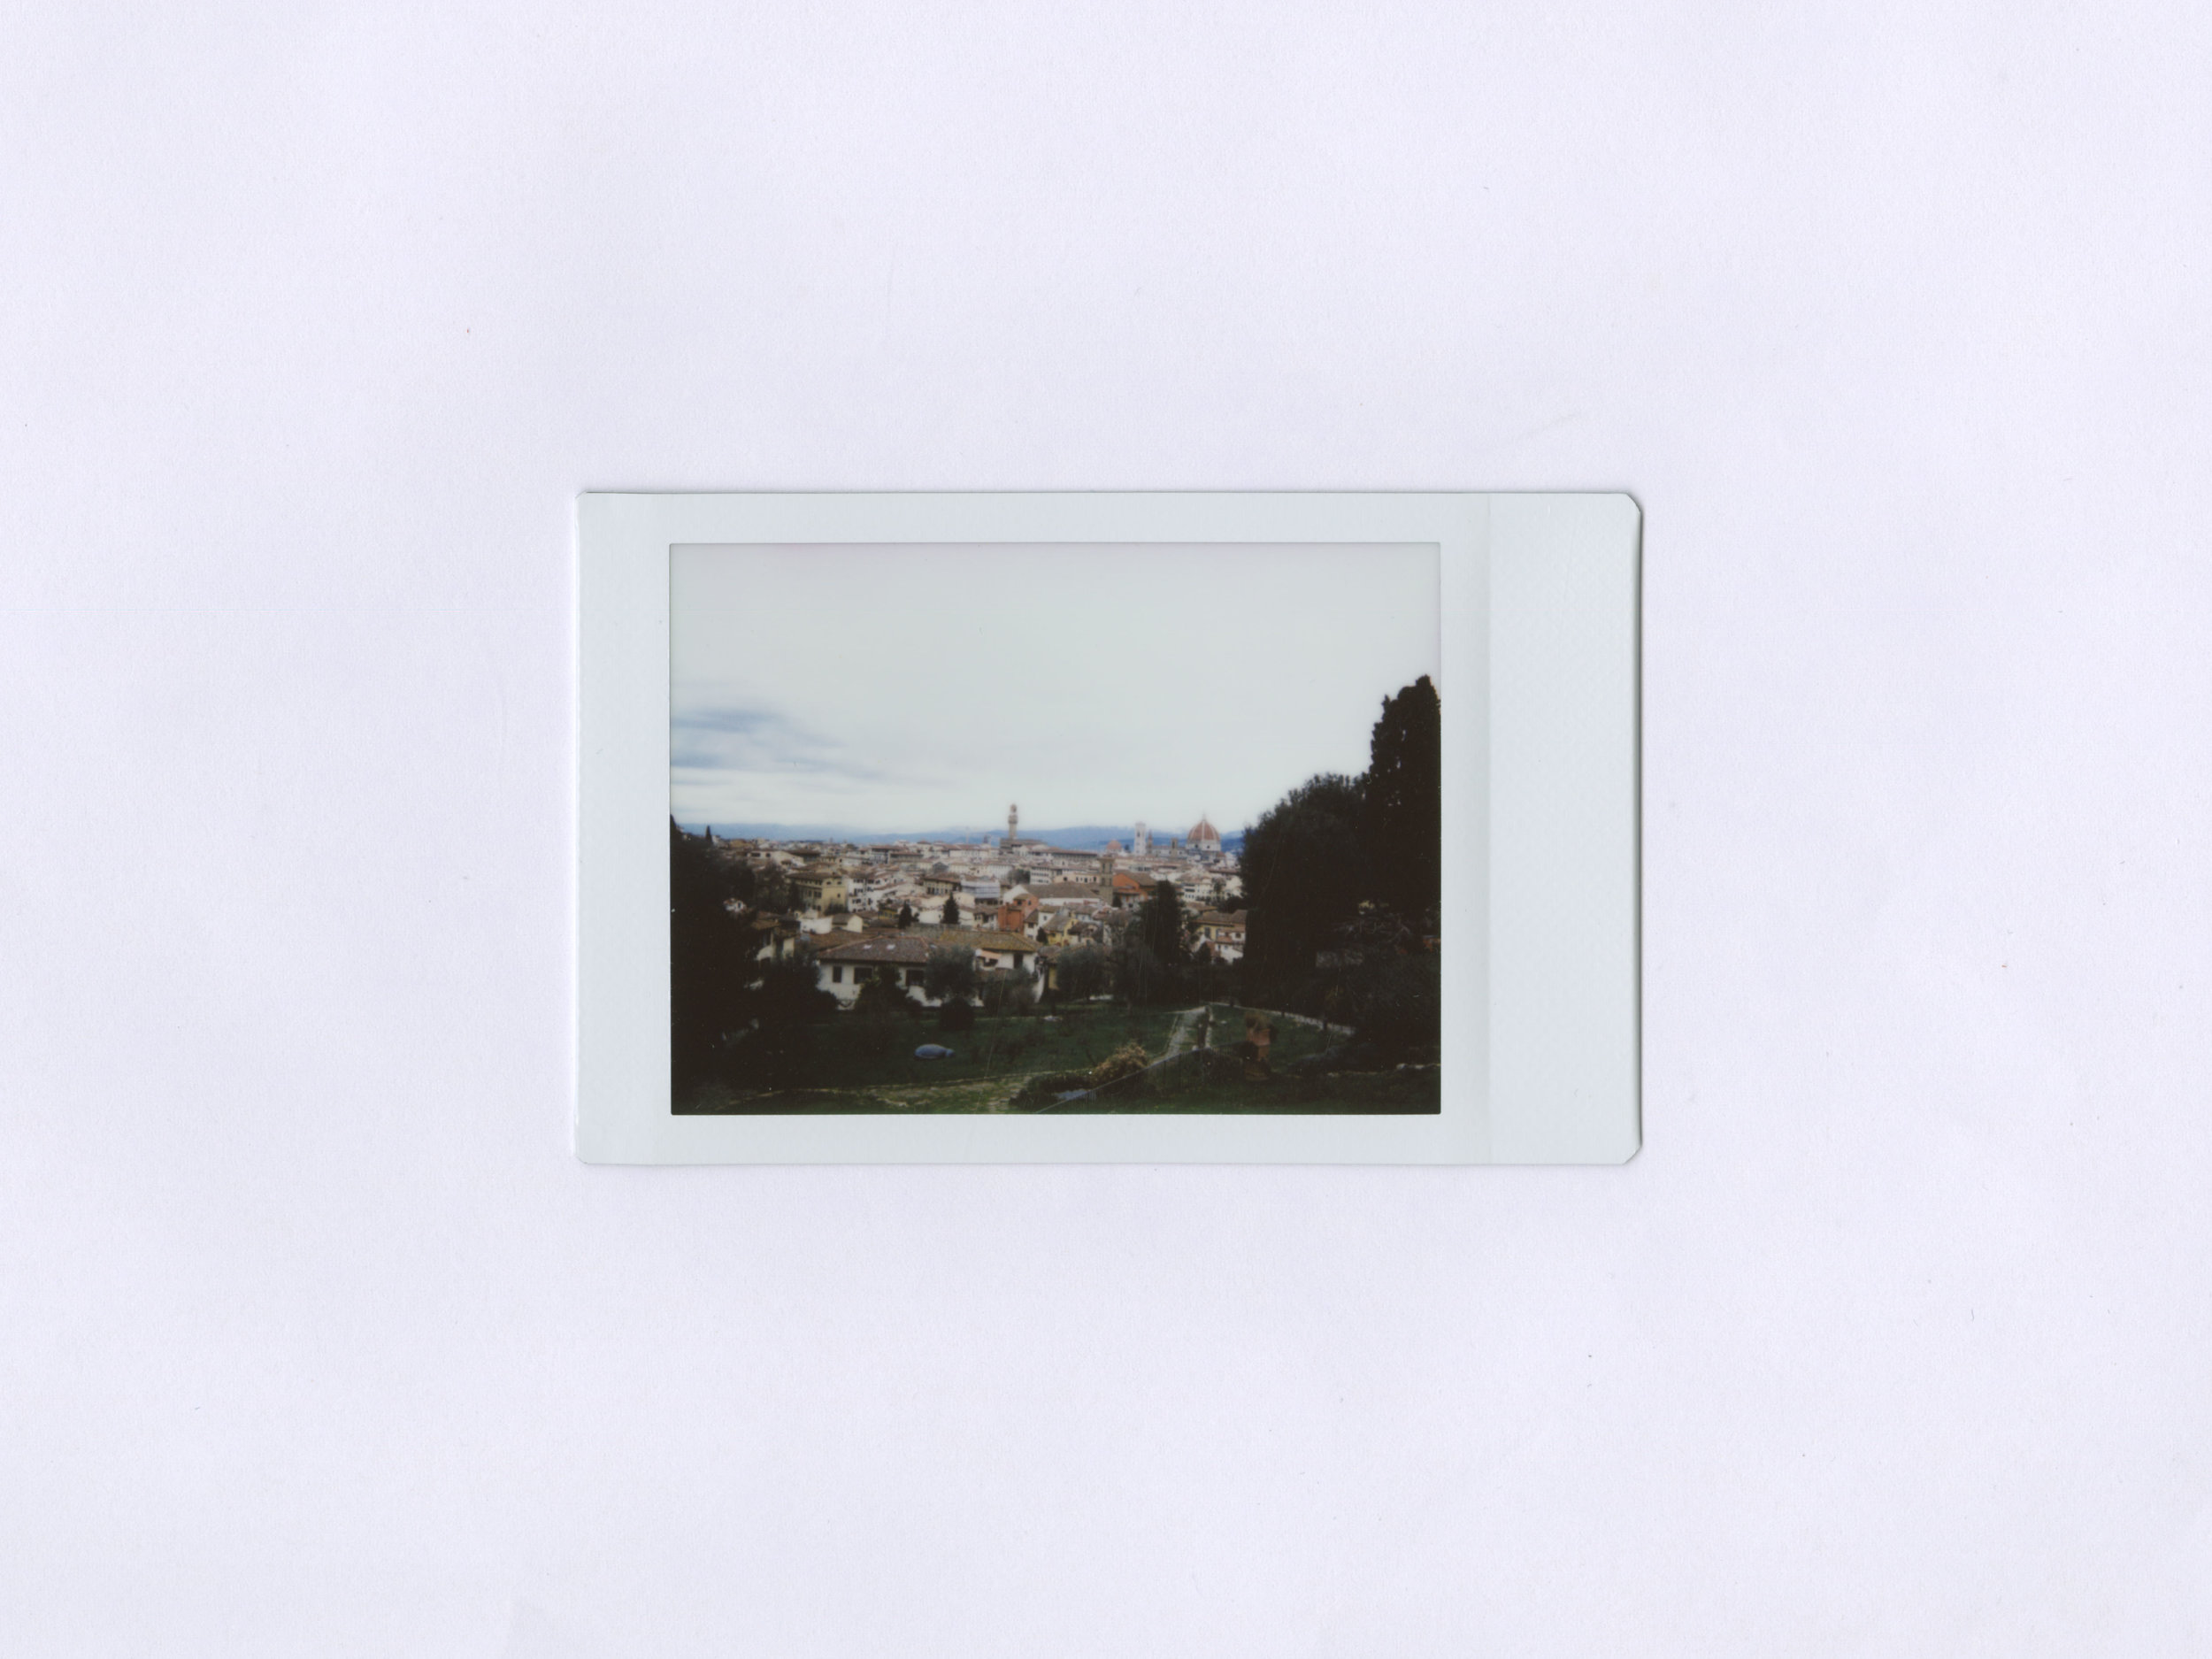 10.fdc189.jpg